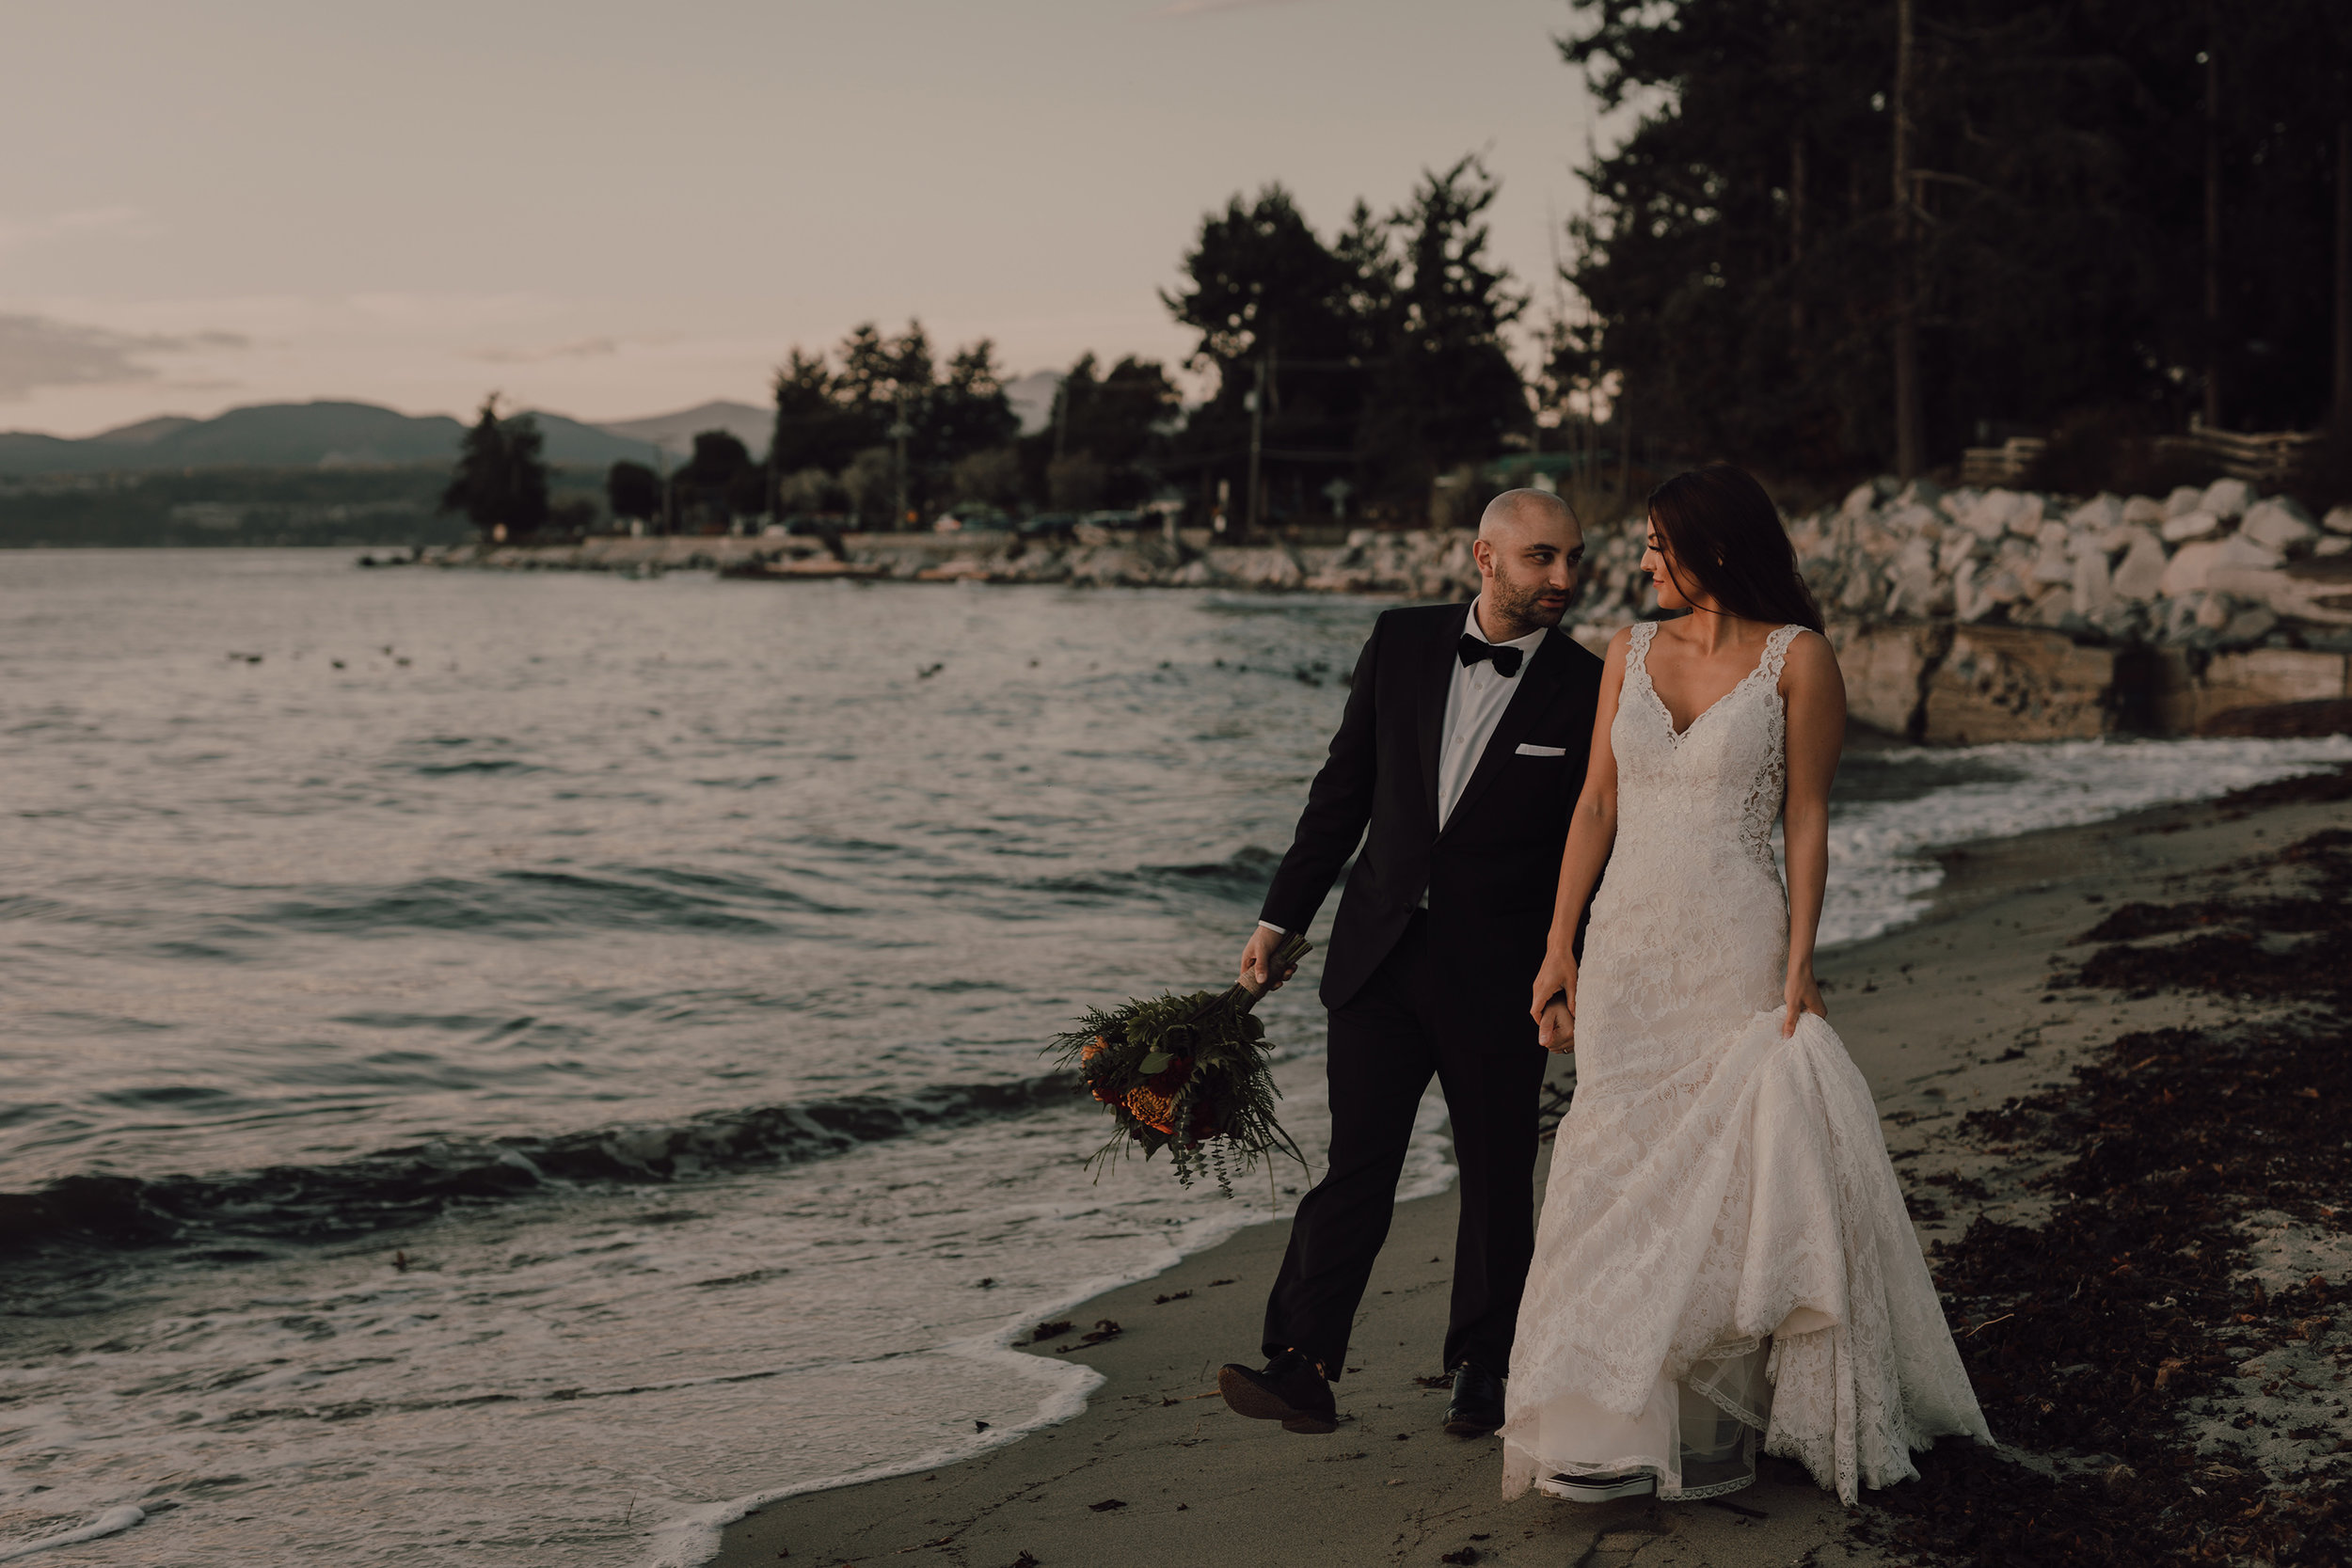 Day After Wedding Photos - Sunshine Coast Wedding Photos - Sunset Wedding Photos - Vancouver Wedding Photographer & Videographer - Sunshine Coast Wedding Photos - Sunshine Coast Wedding Photographer - Jennifer Picard Photography - 1A5A9146.jpg